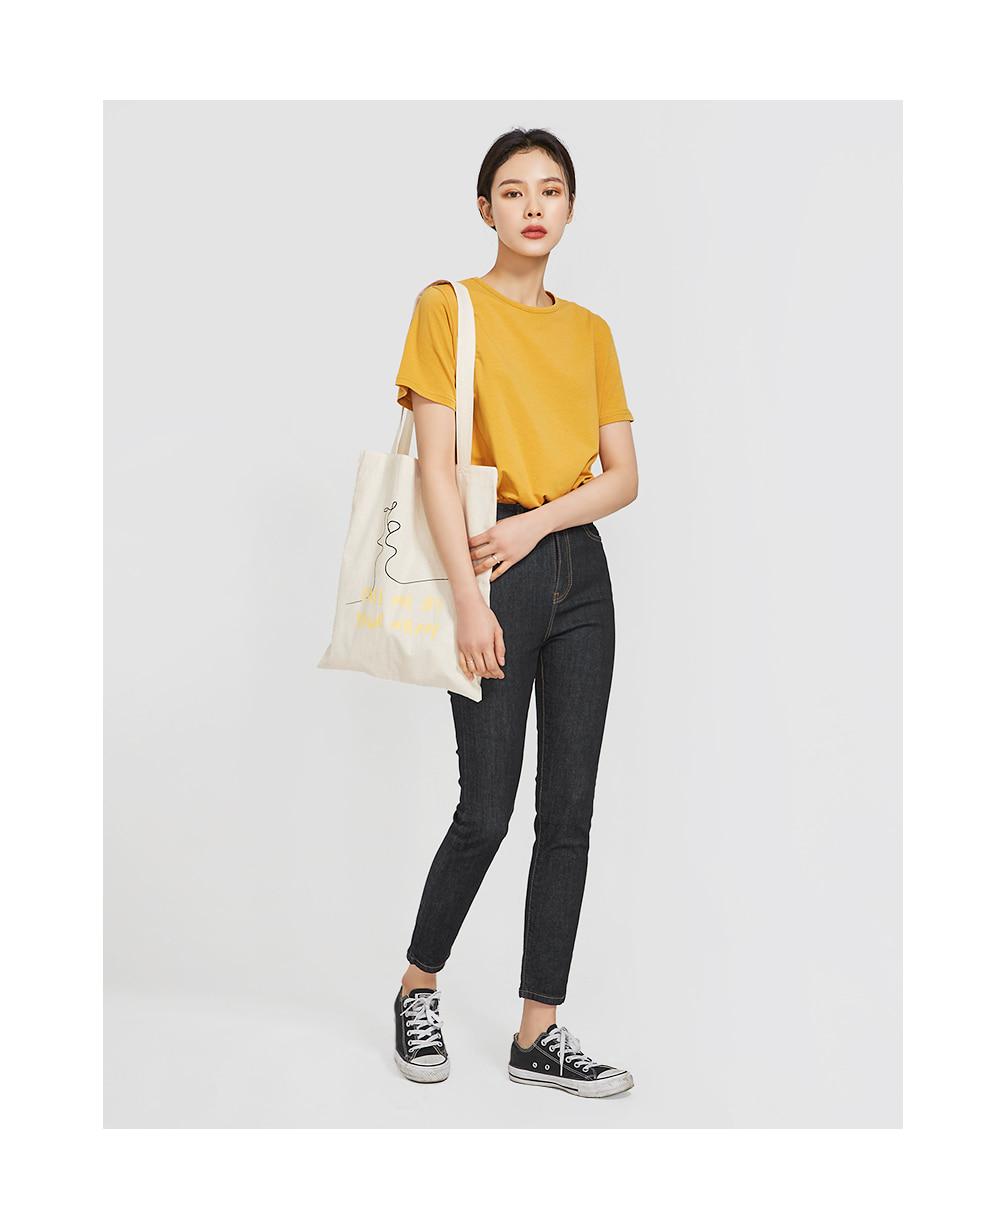 AIN - Korean Fashion - #Kfashion - Love Drawing Eco Bag